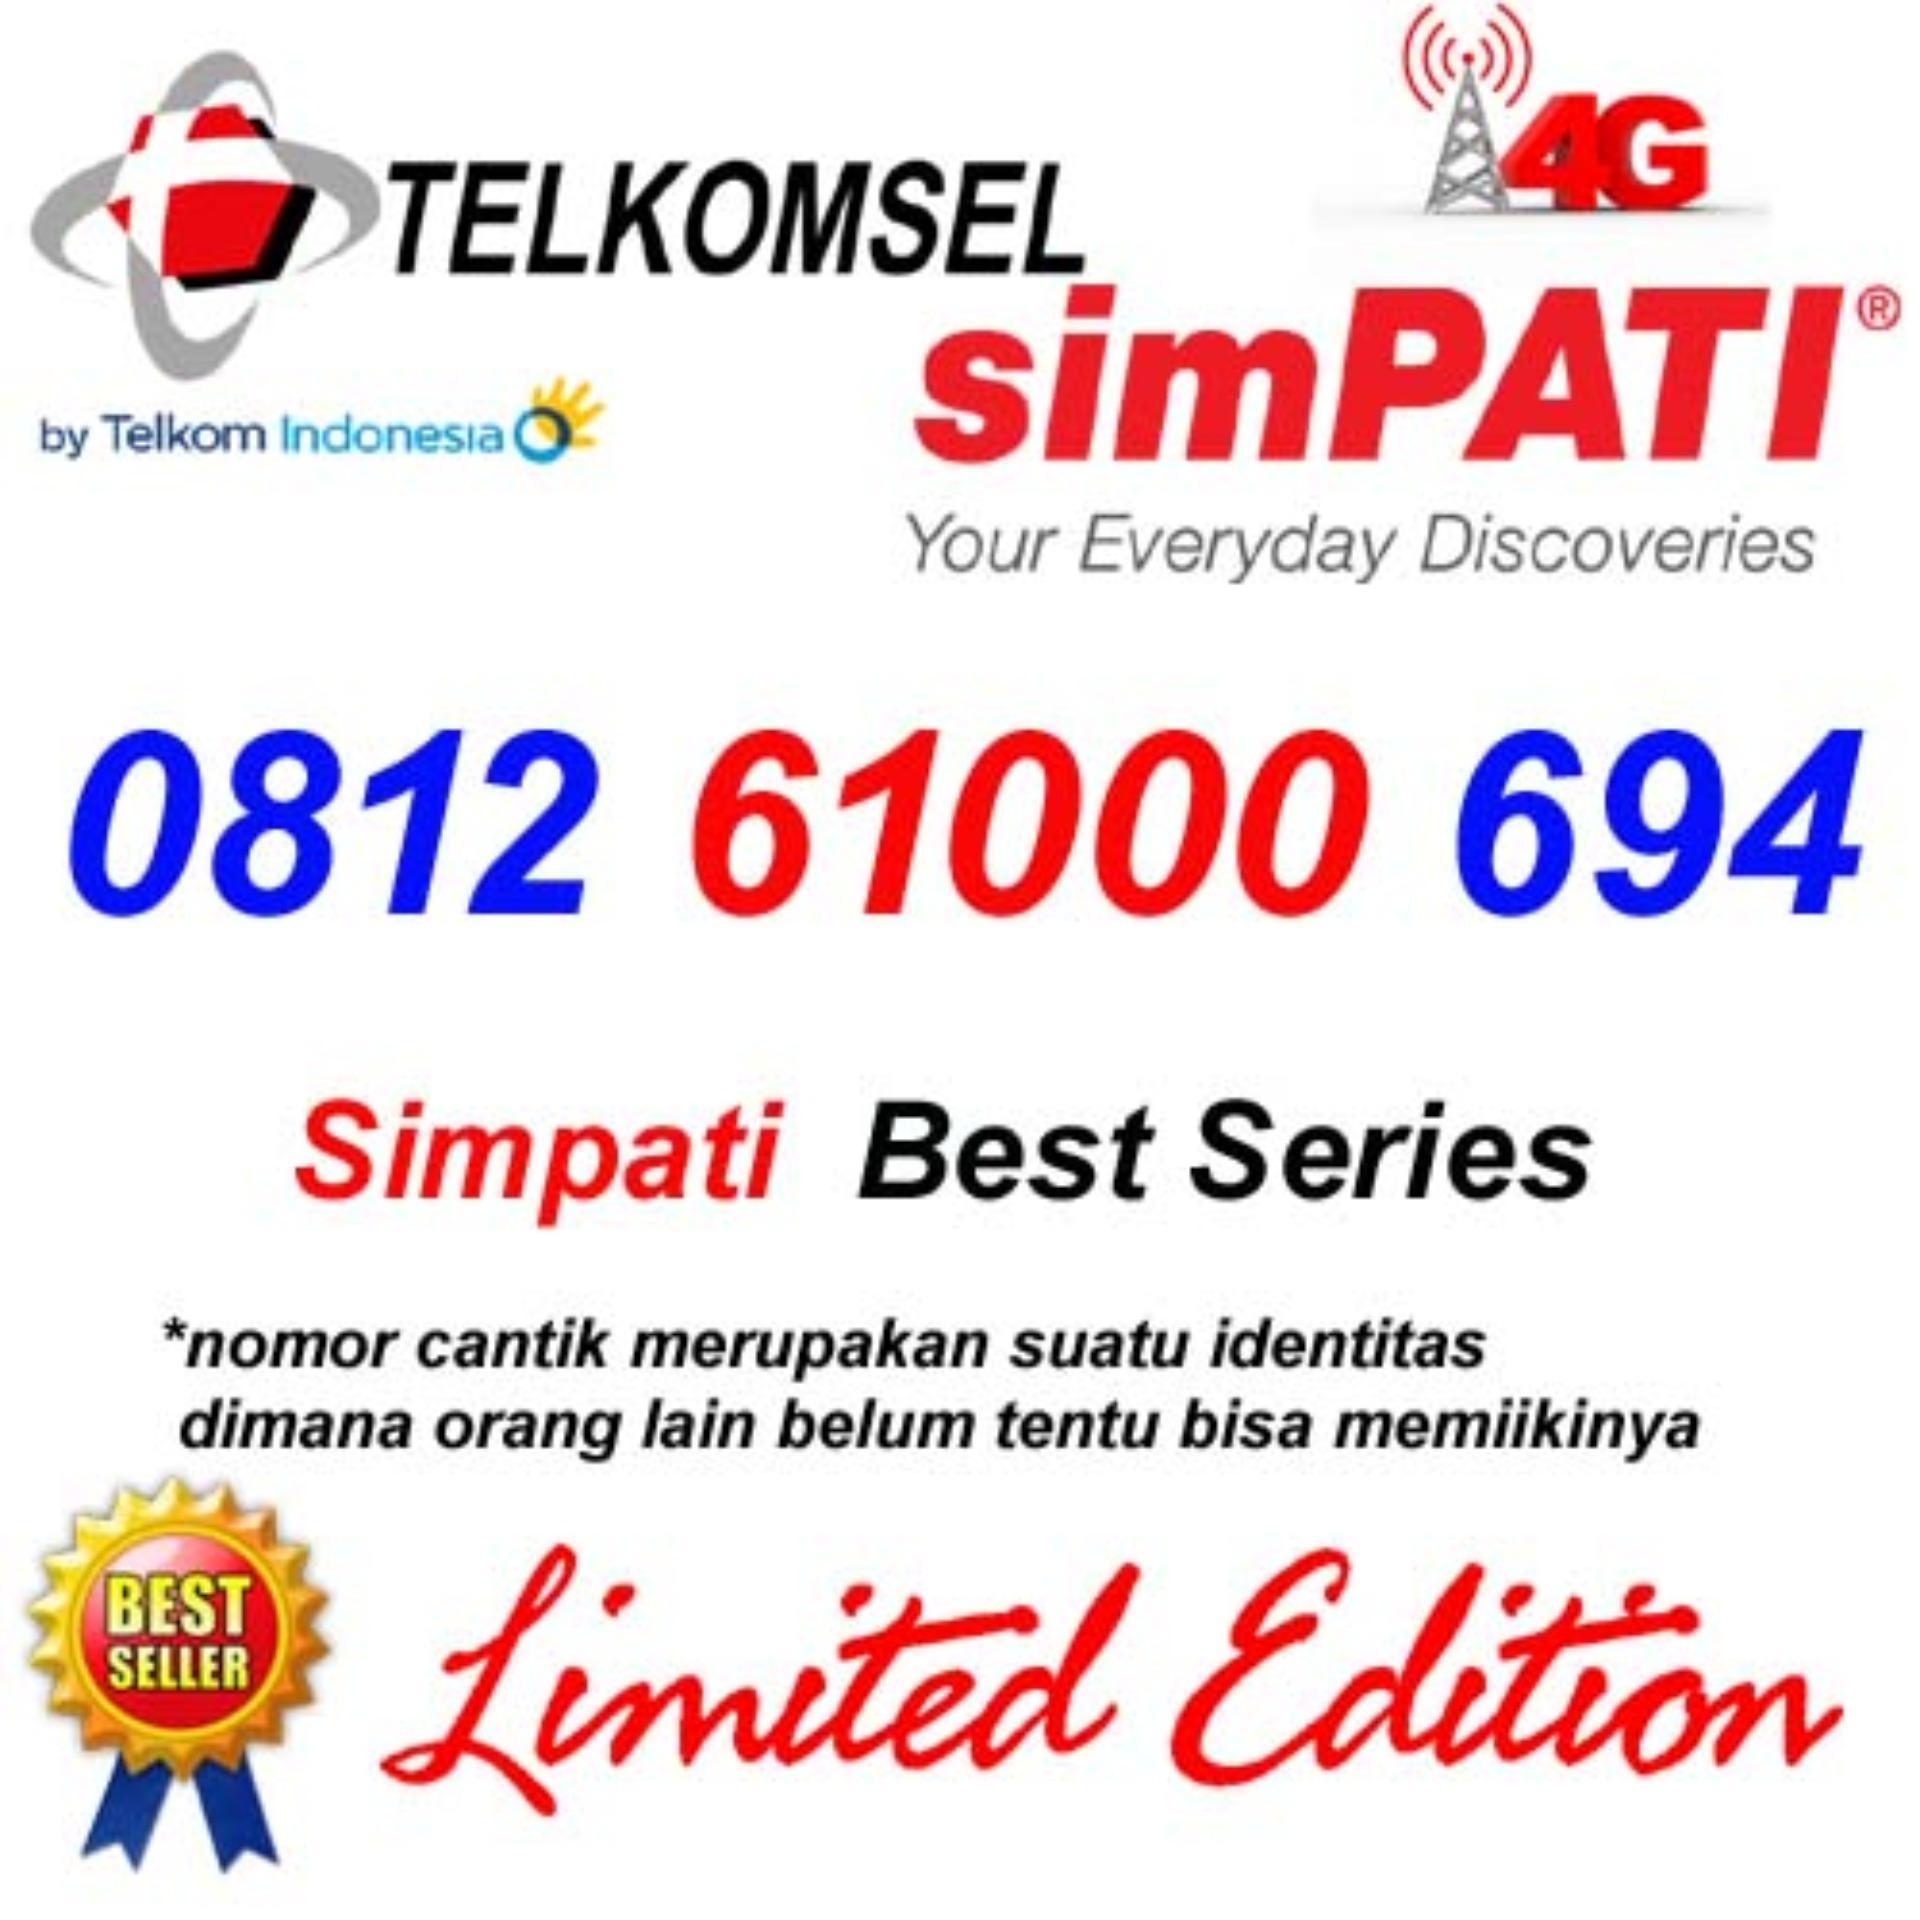 Telkomsel Simpati 4G Lte 0812 61000 694 Kartu Perdana Nomor Cantik